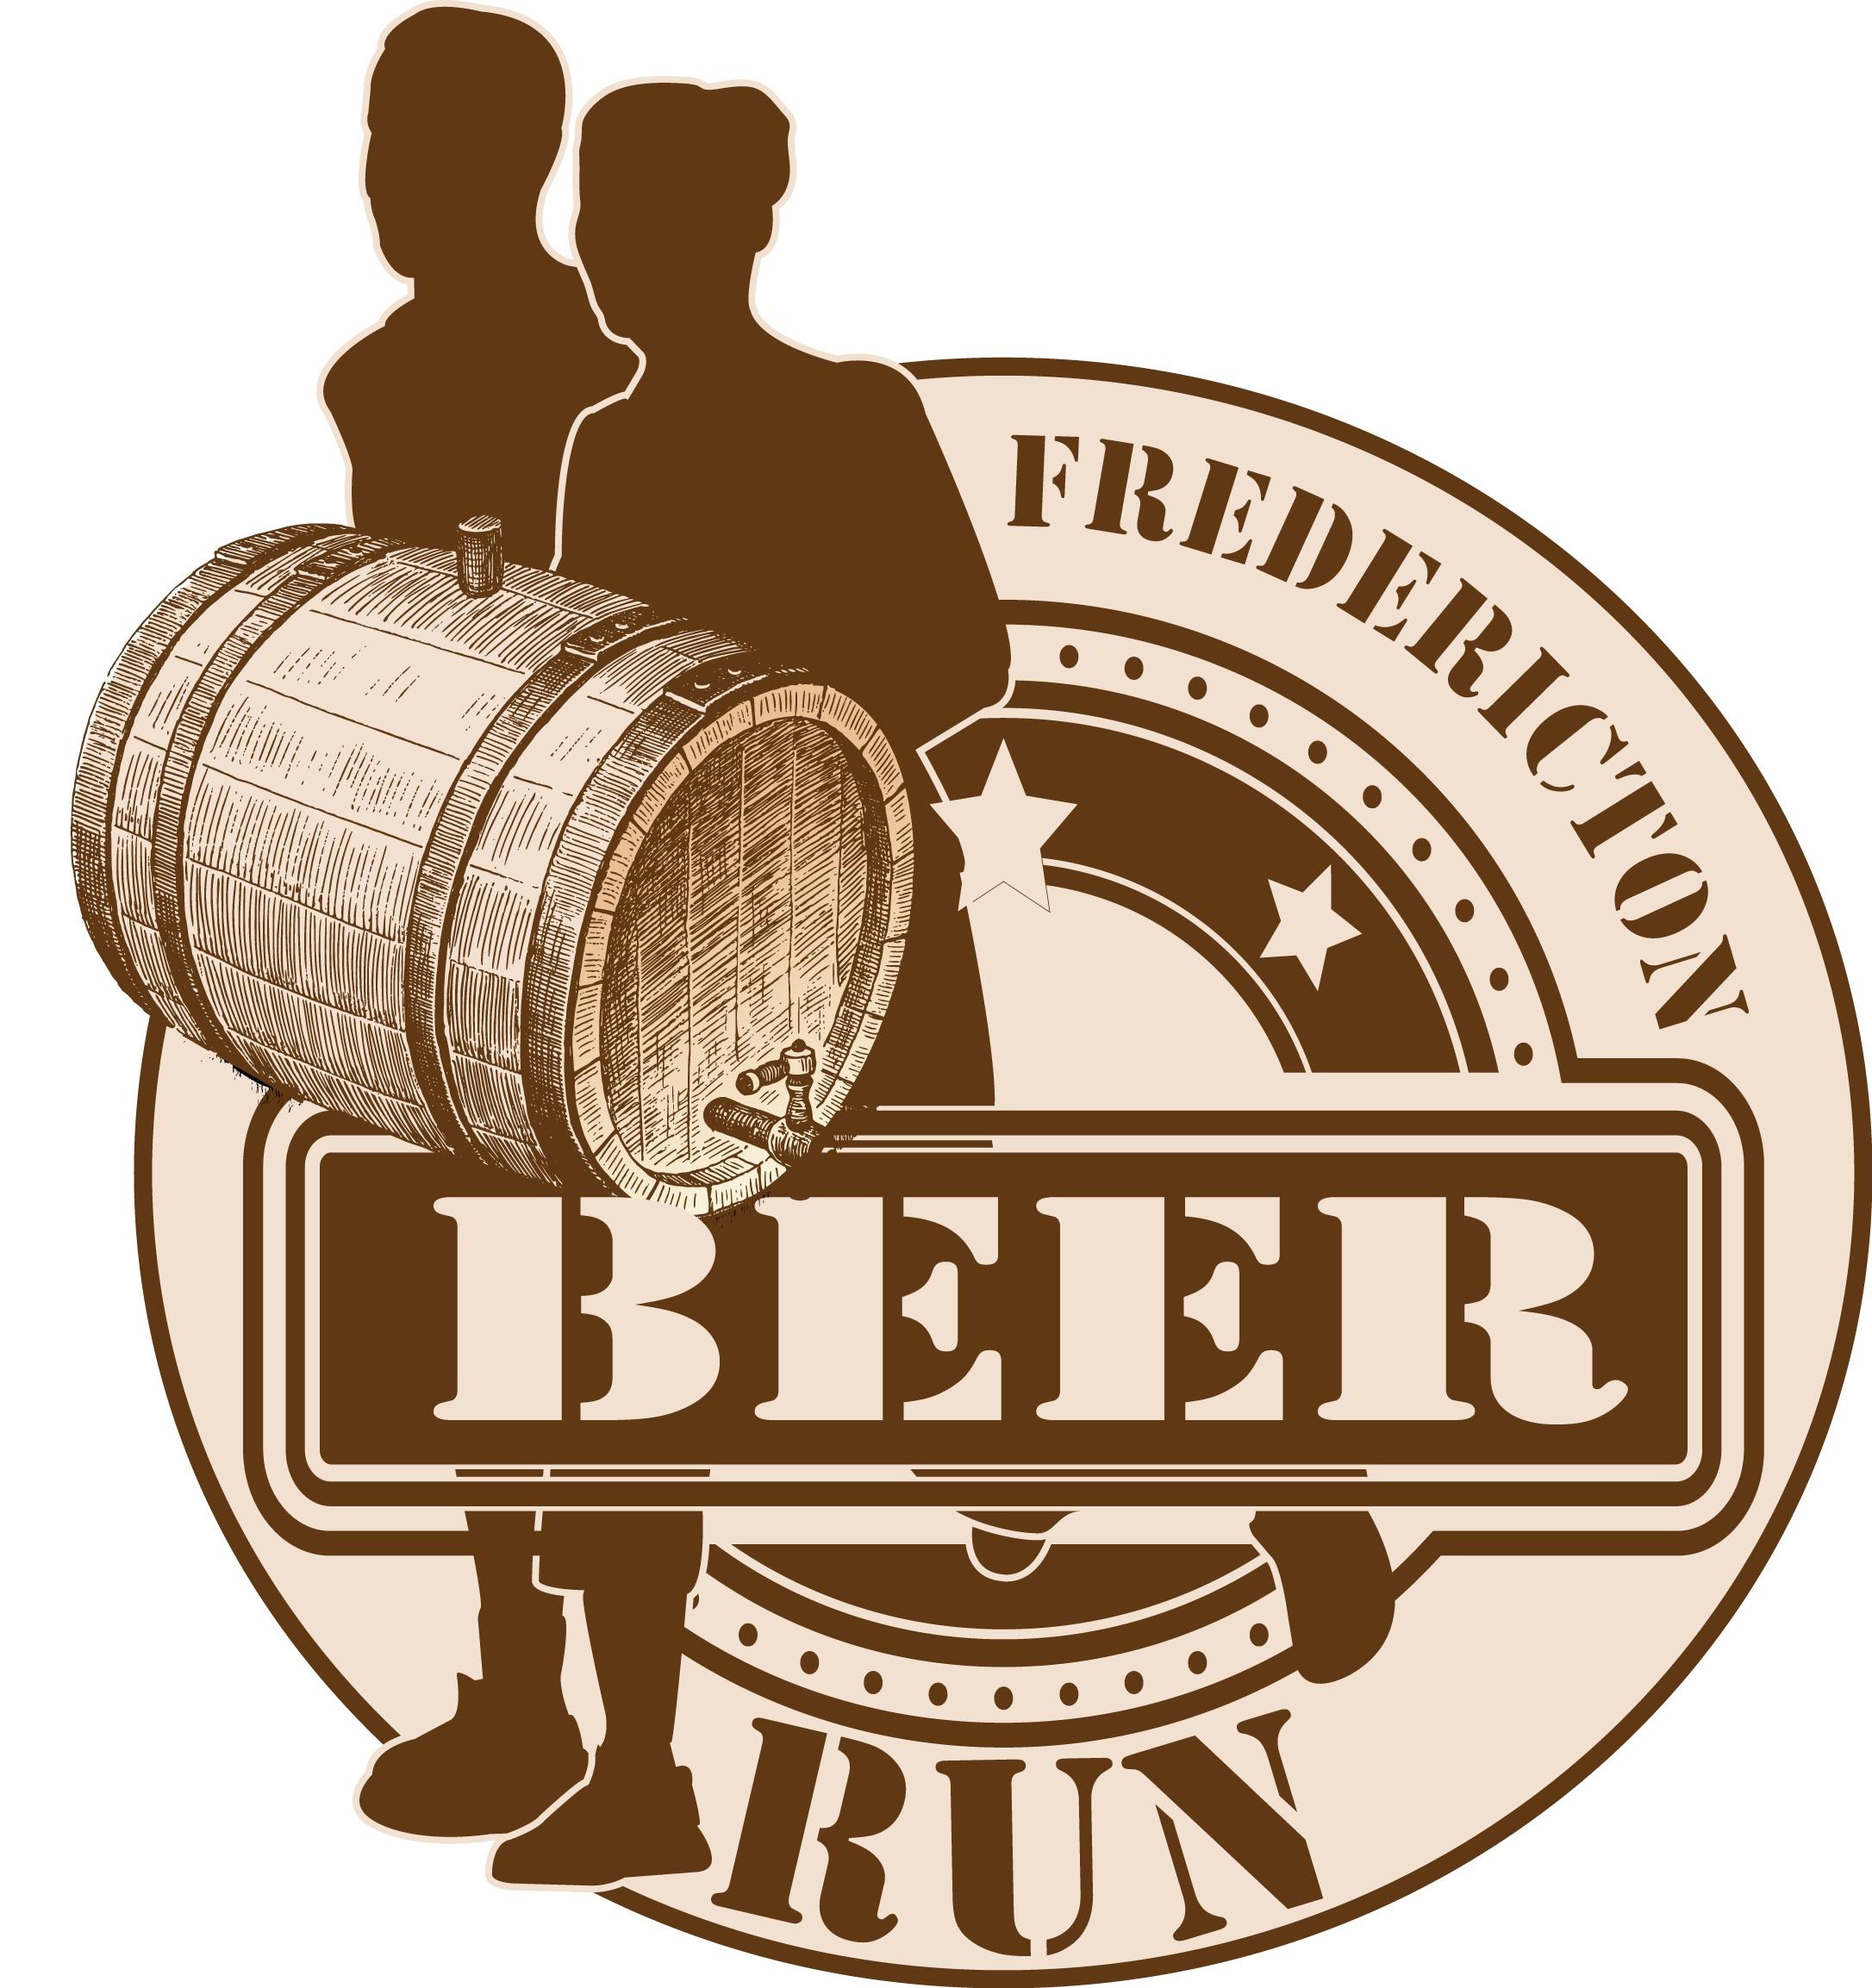 Fredericton Beer Run--NB Day Running Weekend